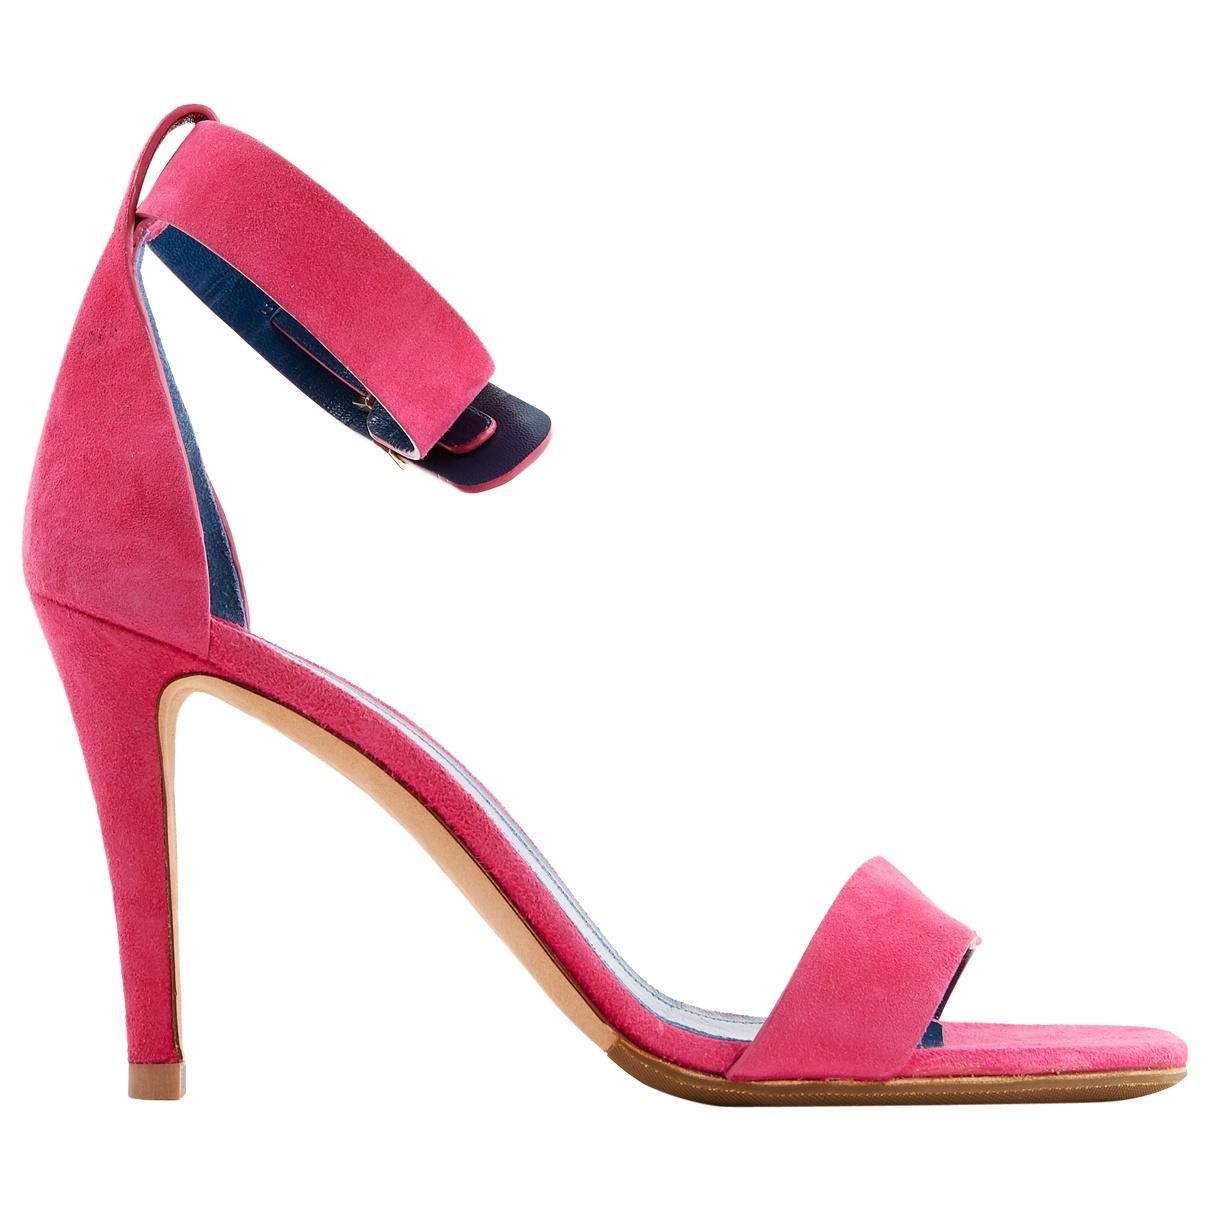 Celine - Sandales   pour femme en suede - rose